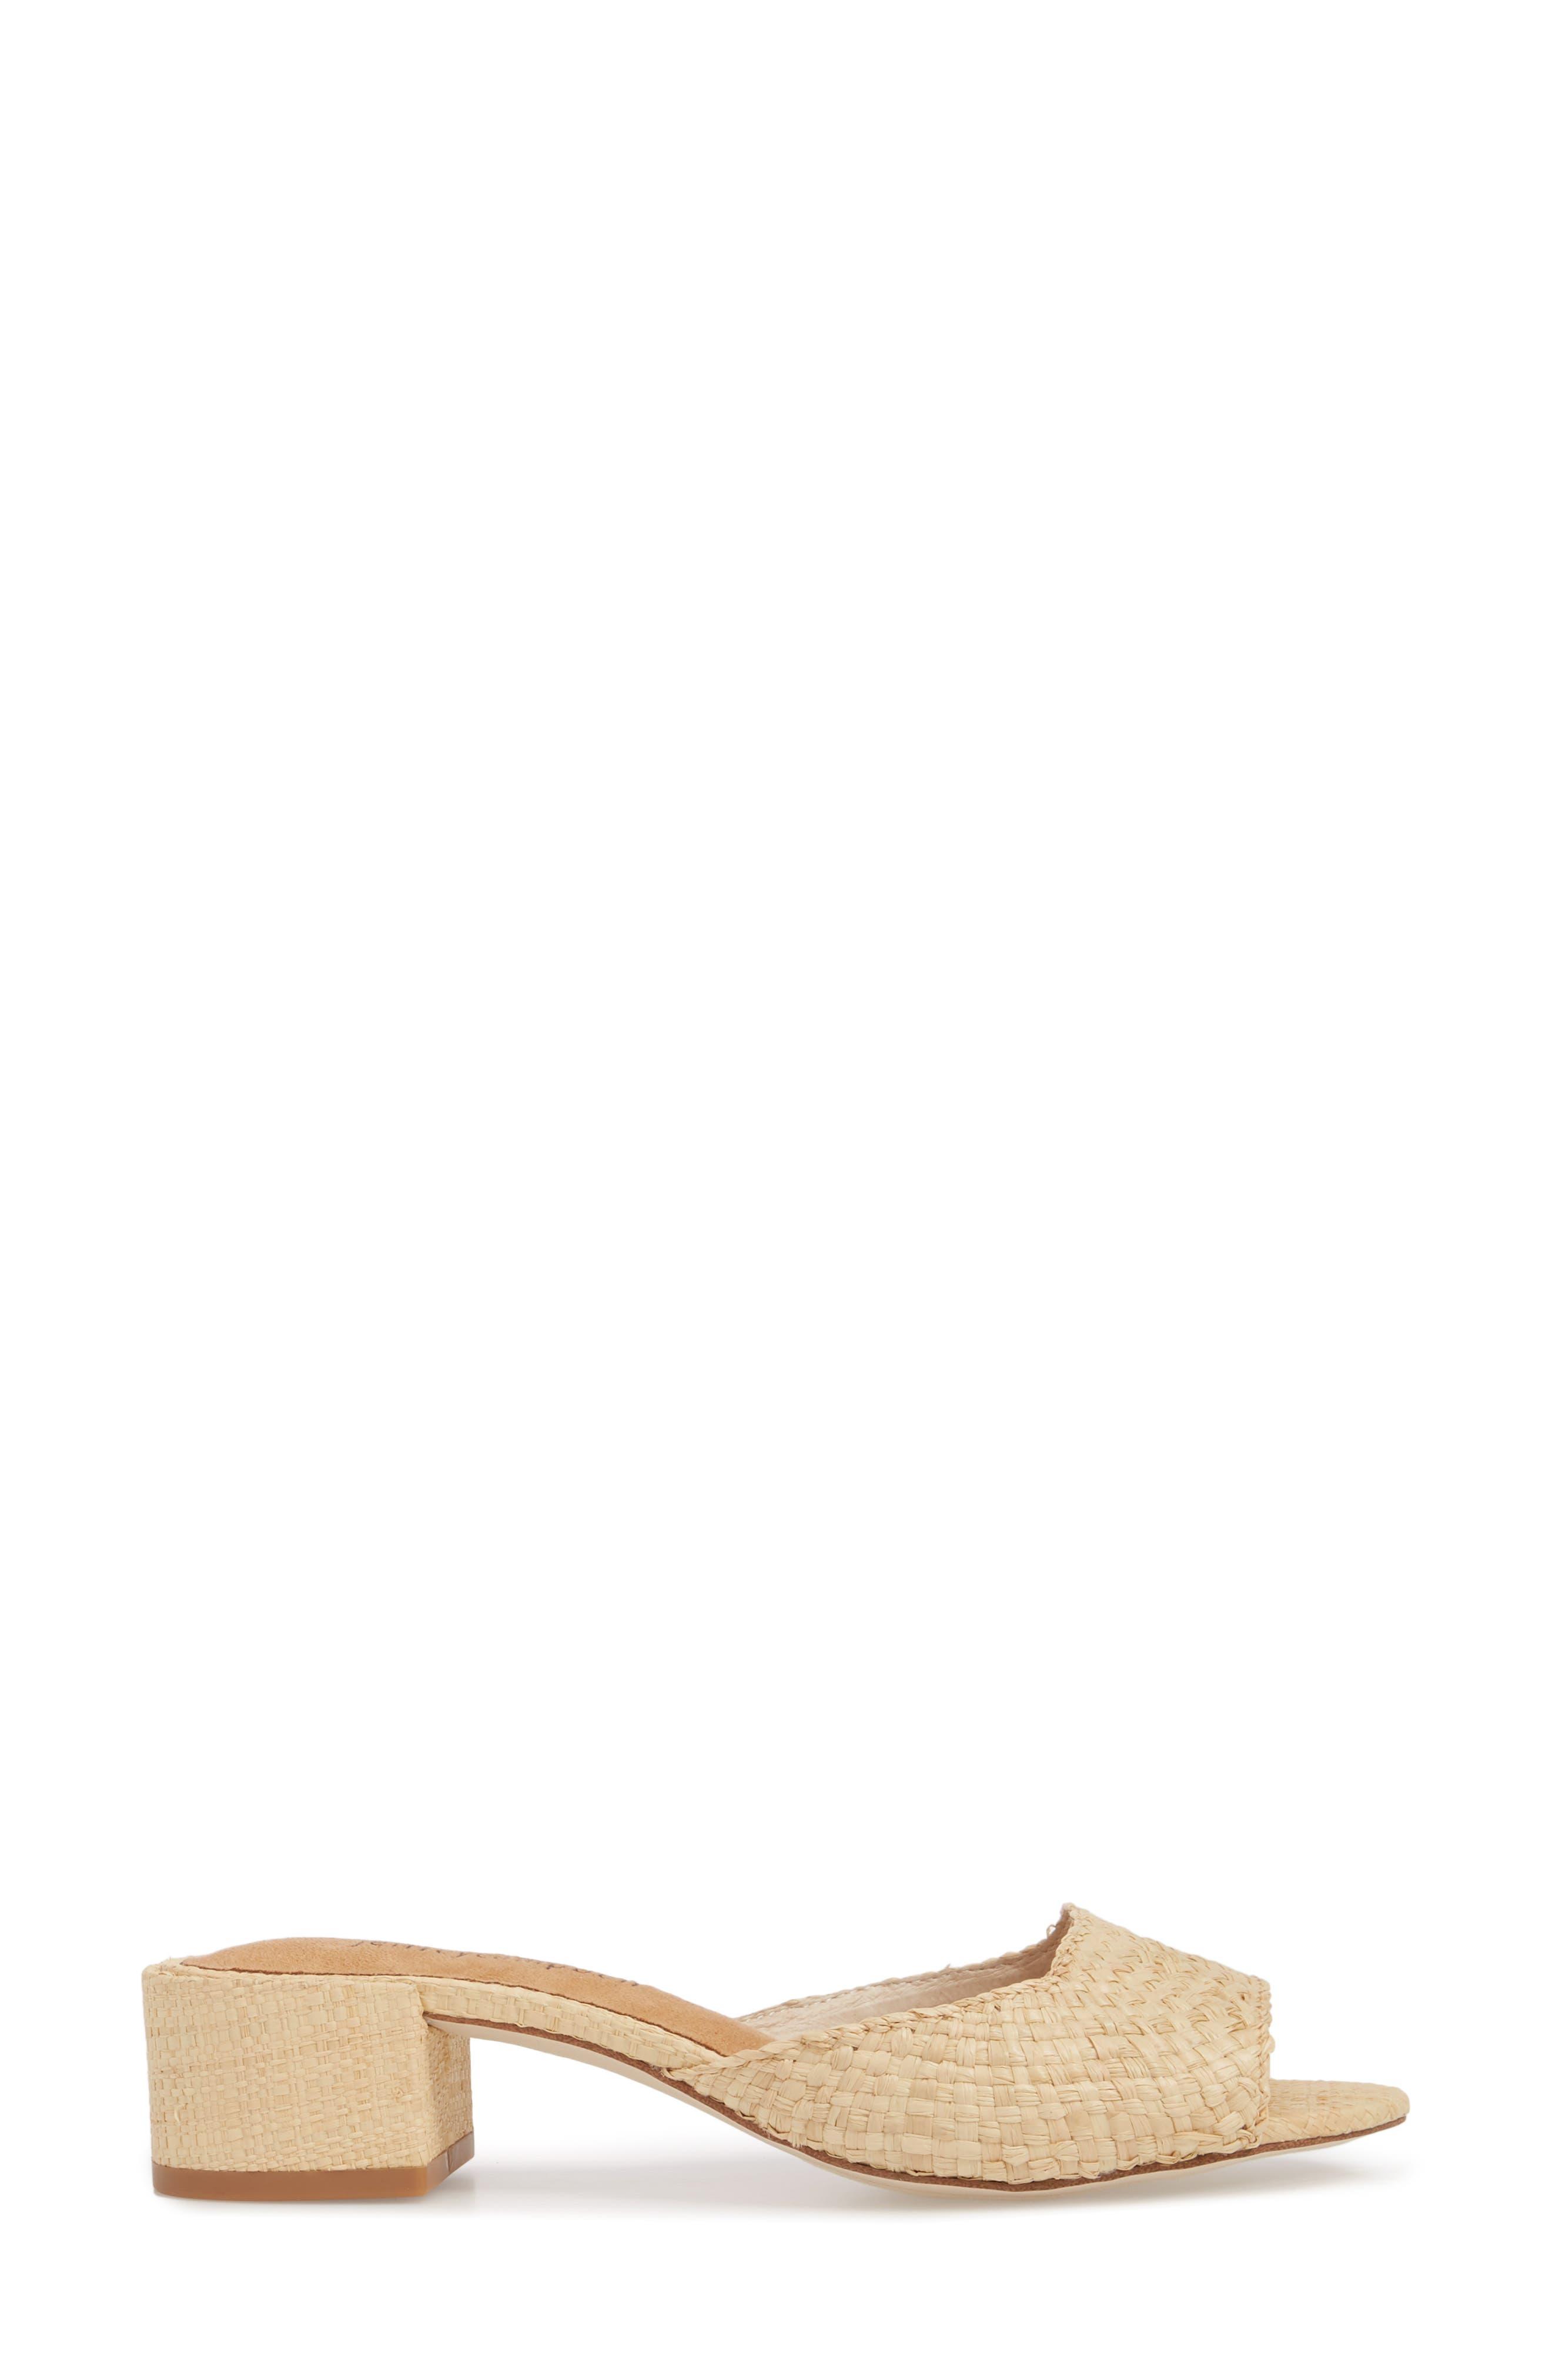 Mélange Slide Sandal,                             Alternate thumbnail 3, color,                             250